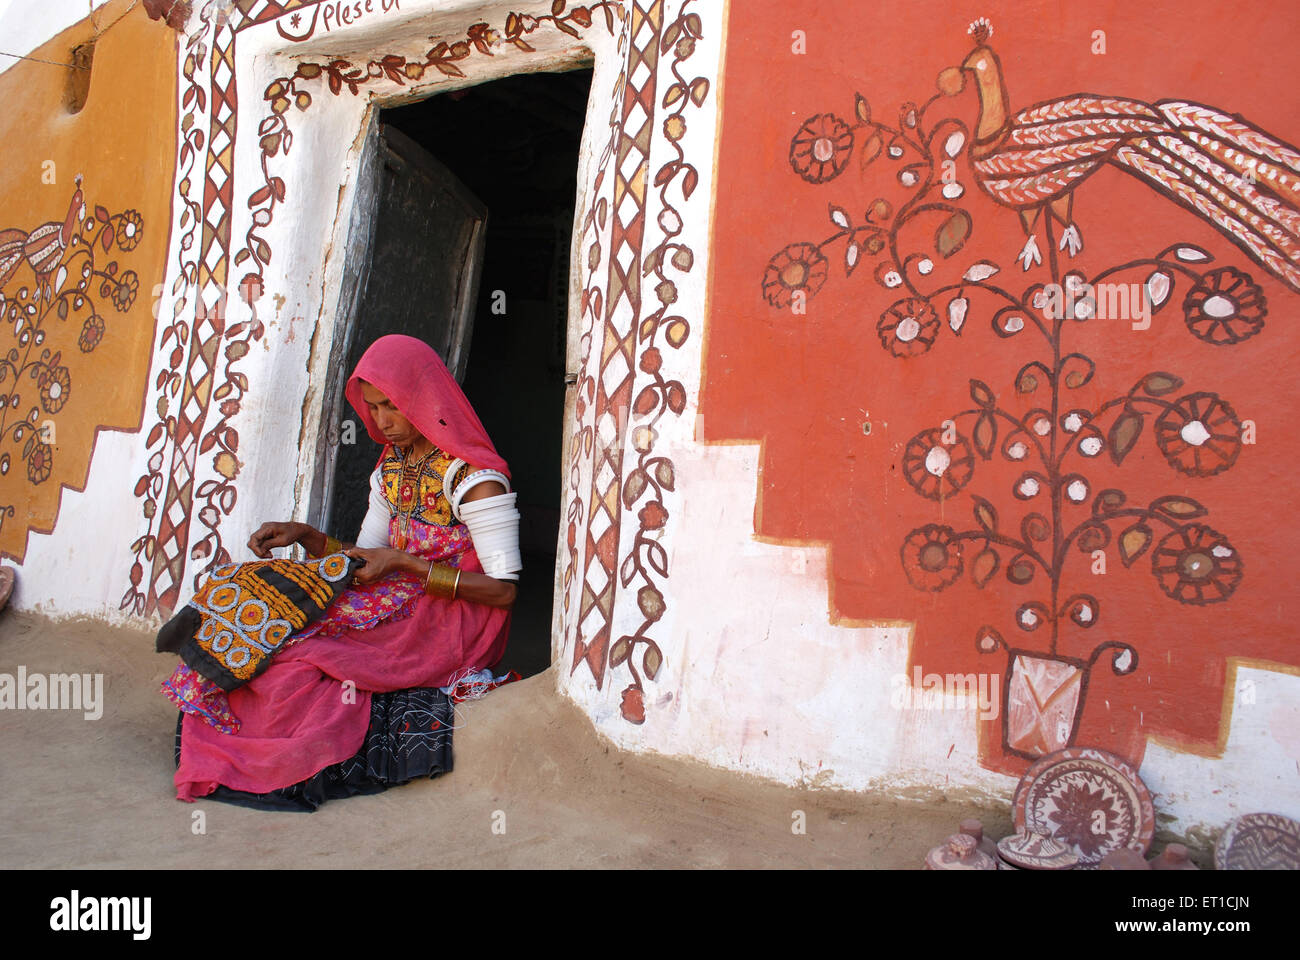 Indian woman doing embroidery work Khuri Jaisalmer Rajasthan India Stock Photo